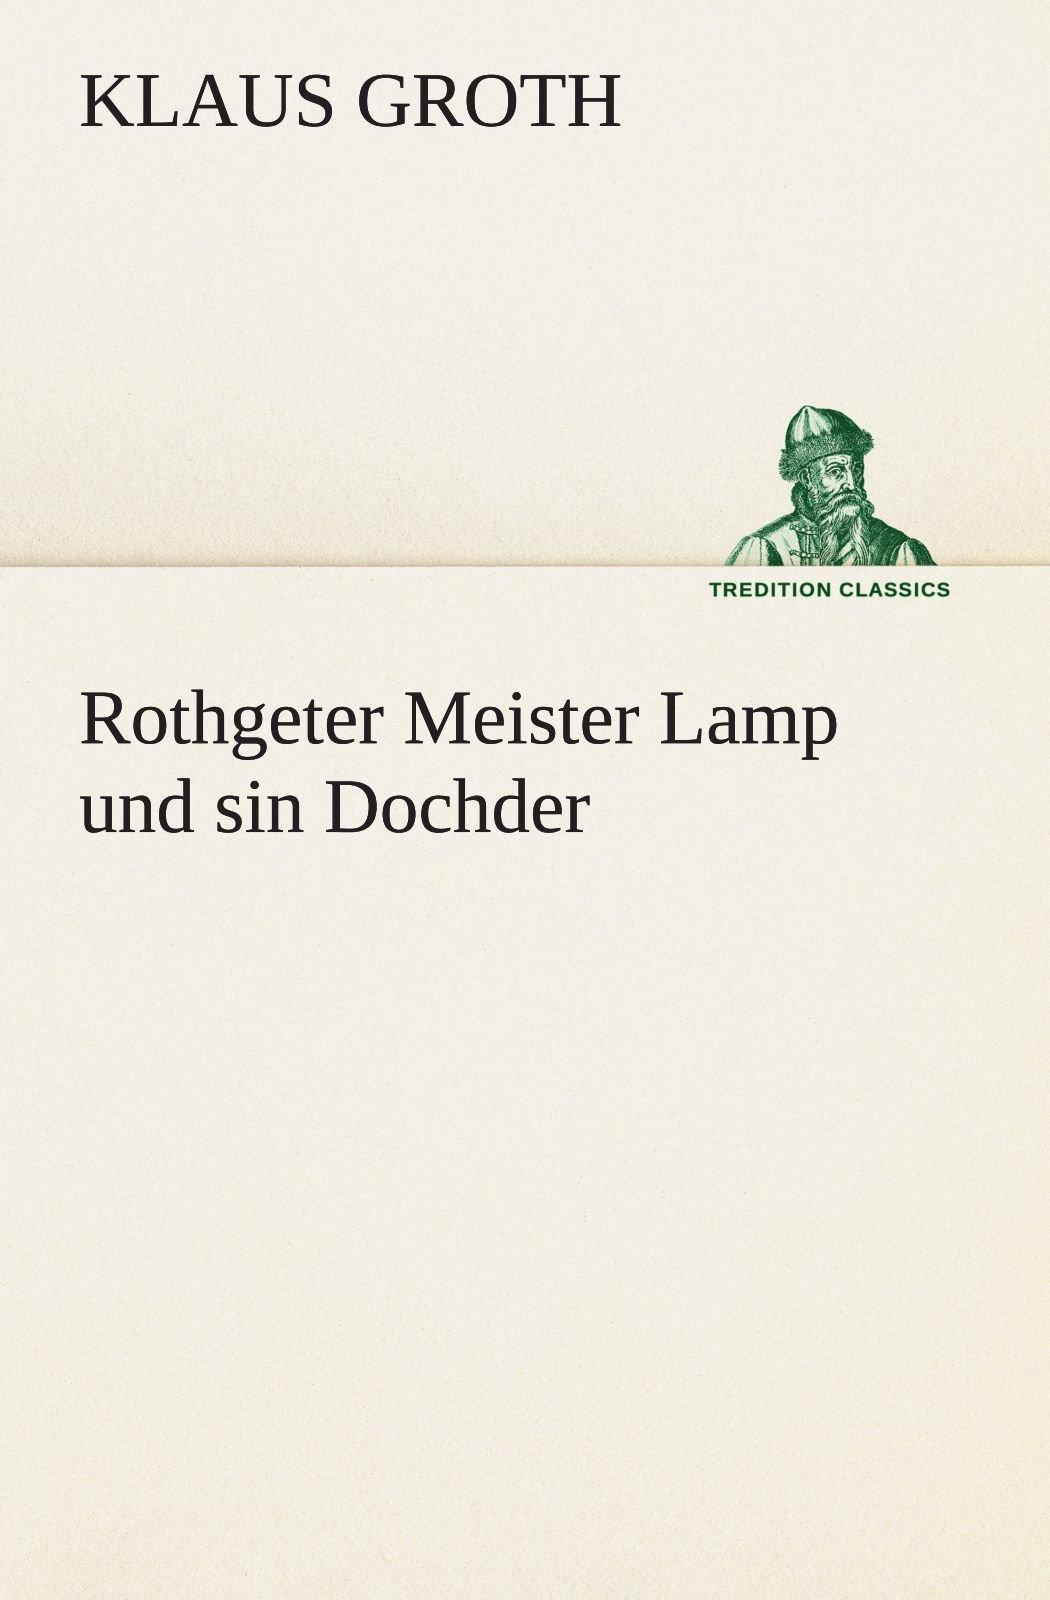 Download Rothgeter Meister Lamp und sin Dochder (TREDITION CLASSICS) (German Edition) ebook